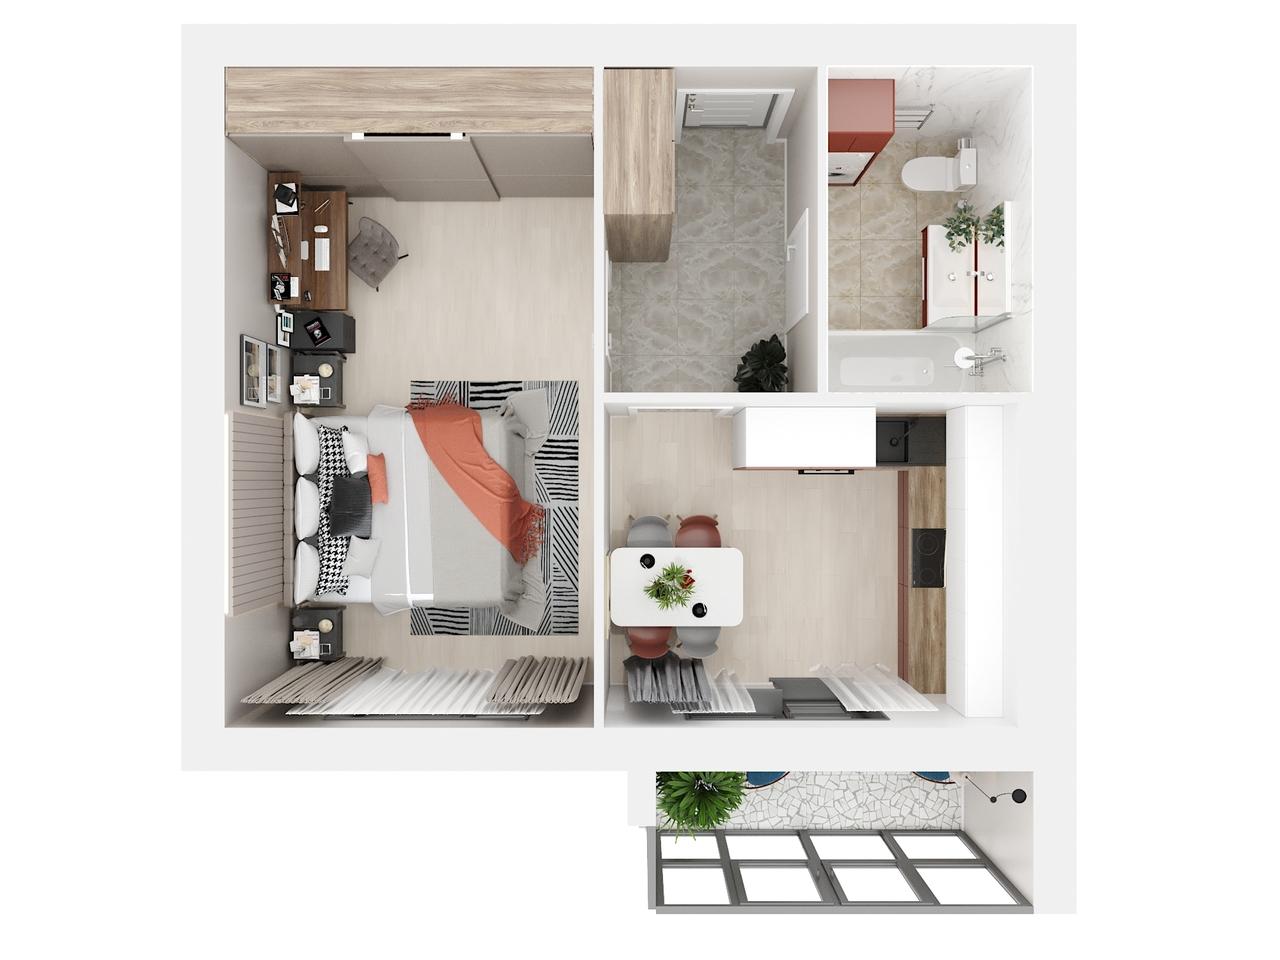 Дом 3 - 1-комнатная квартира №26